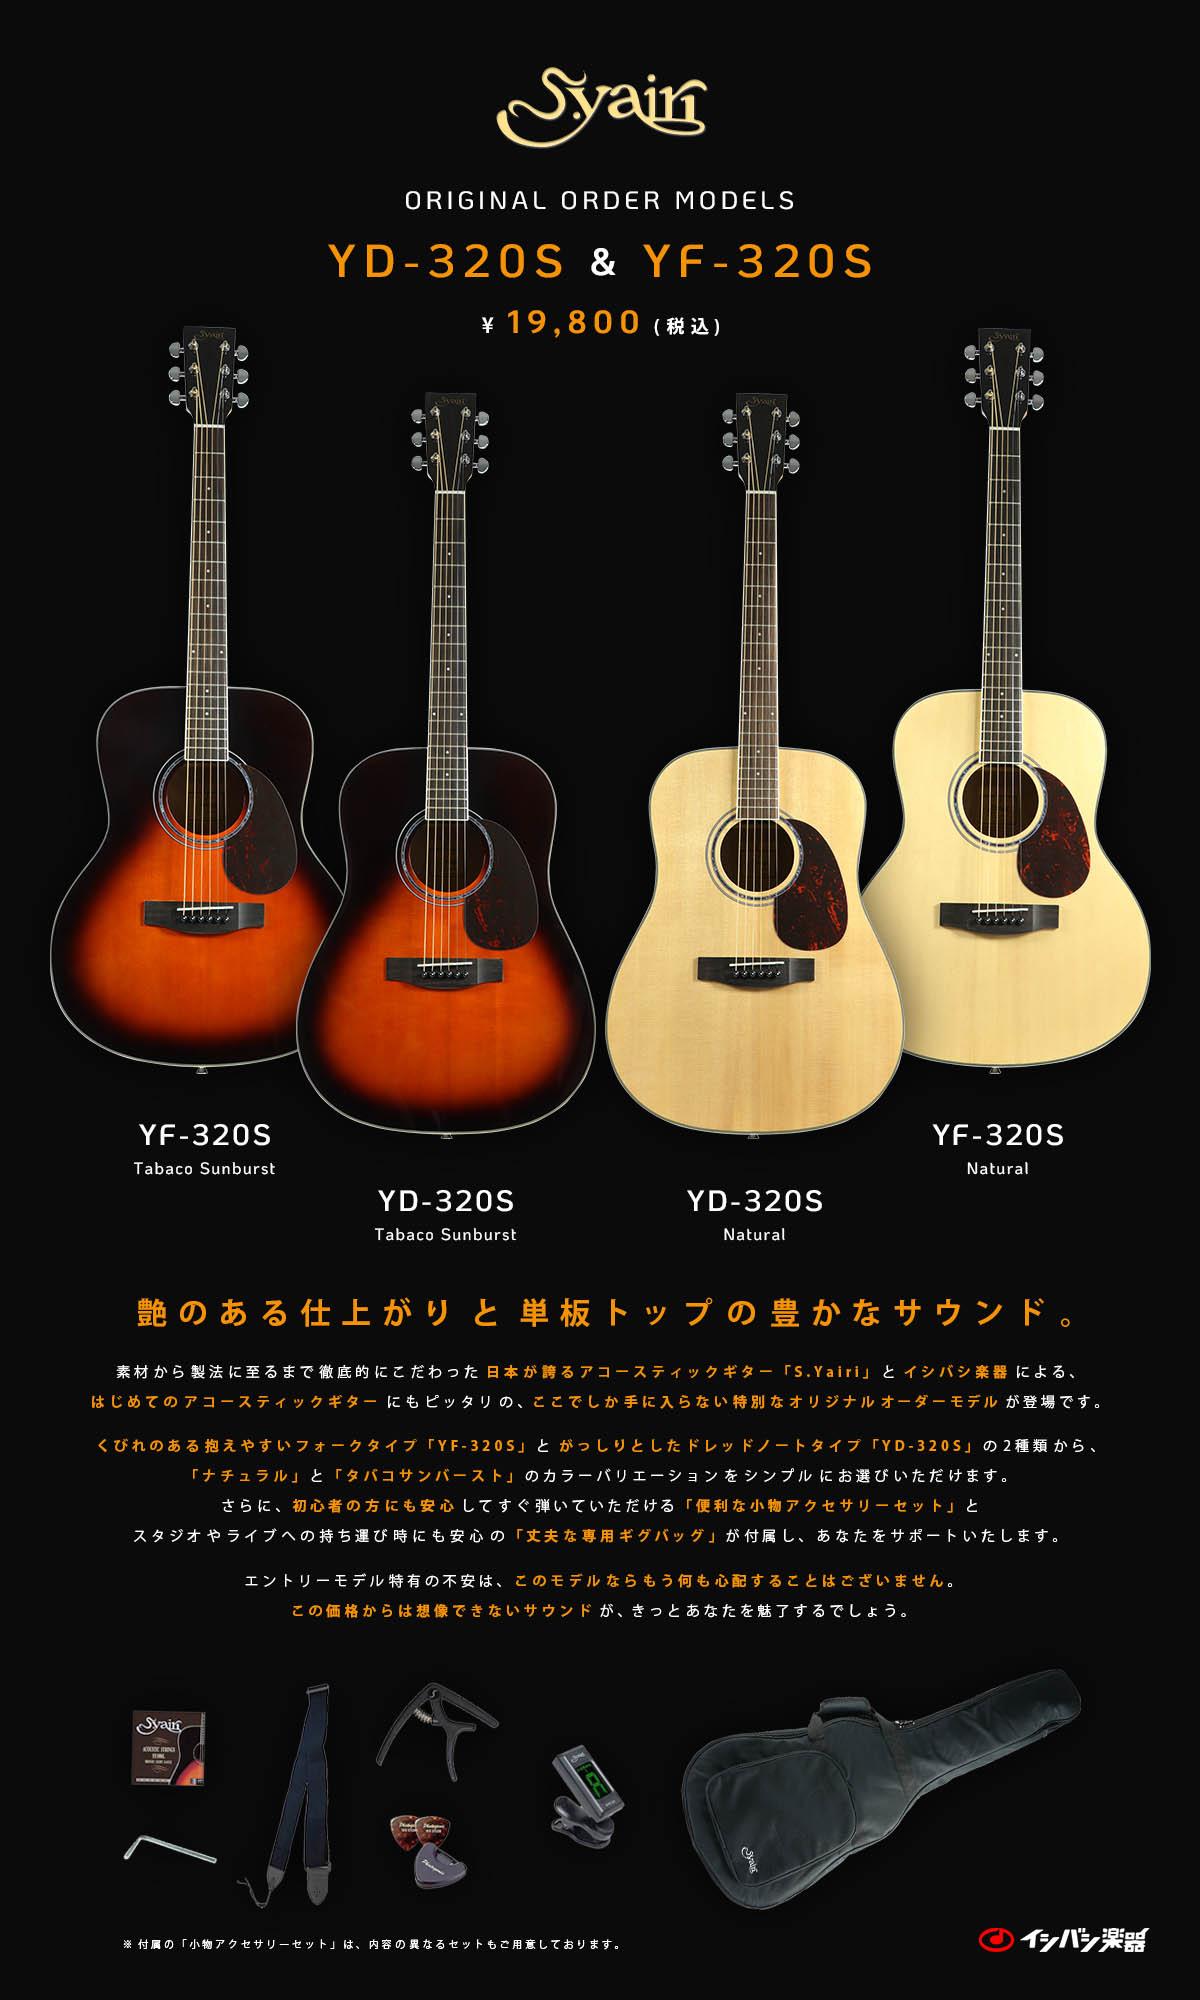 S.Yairi|YF-320S&YD-320S イシバシ楽器 オリジナルオーダーモデル【イシバシ楽器】